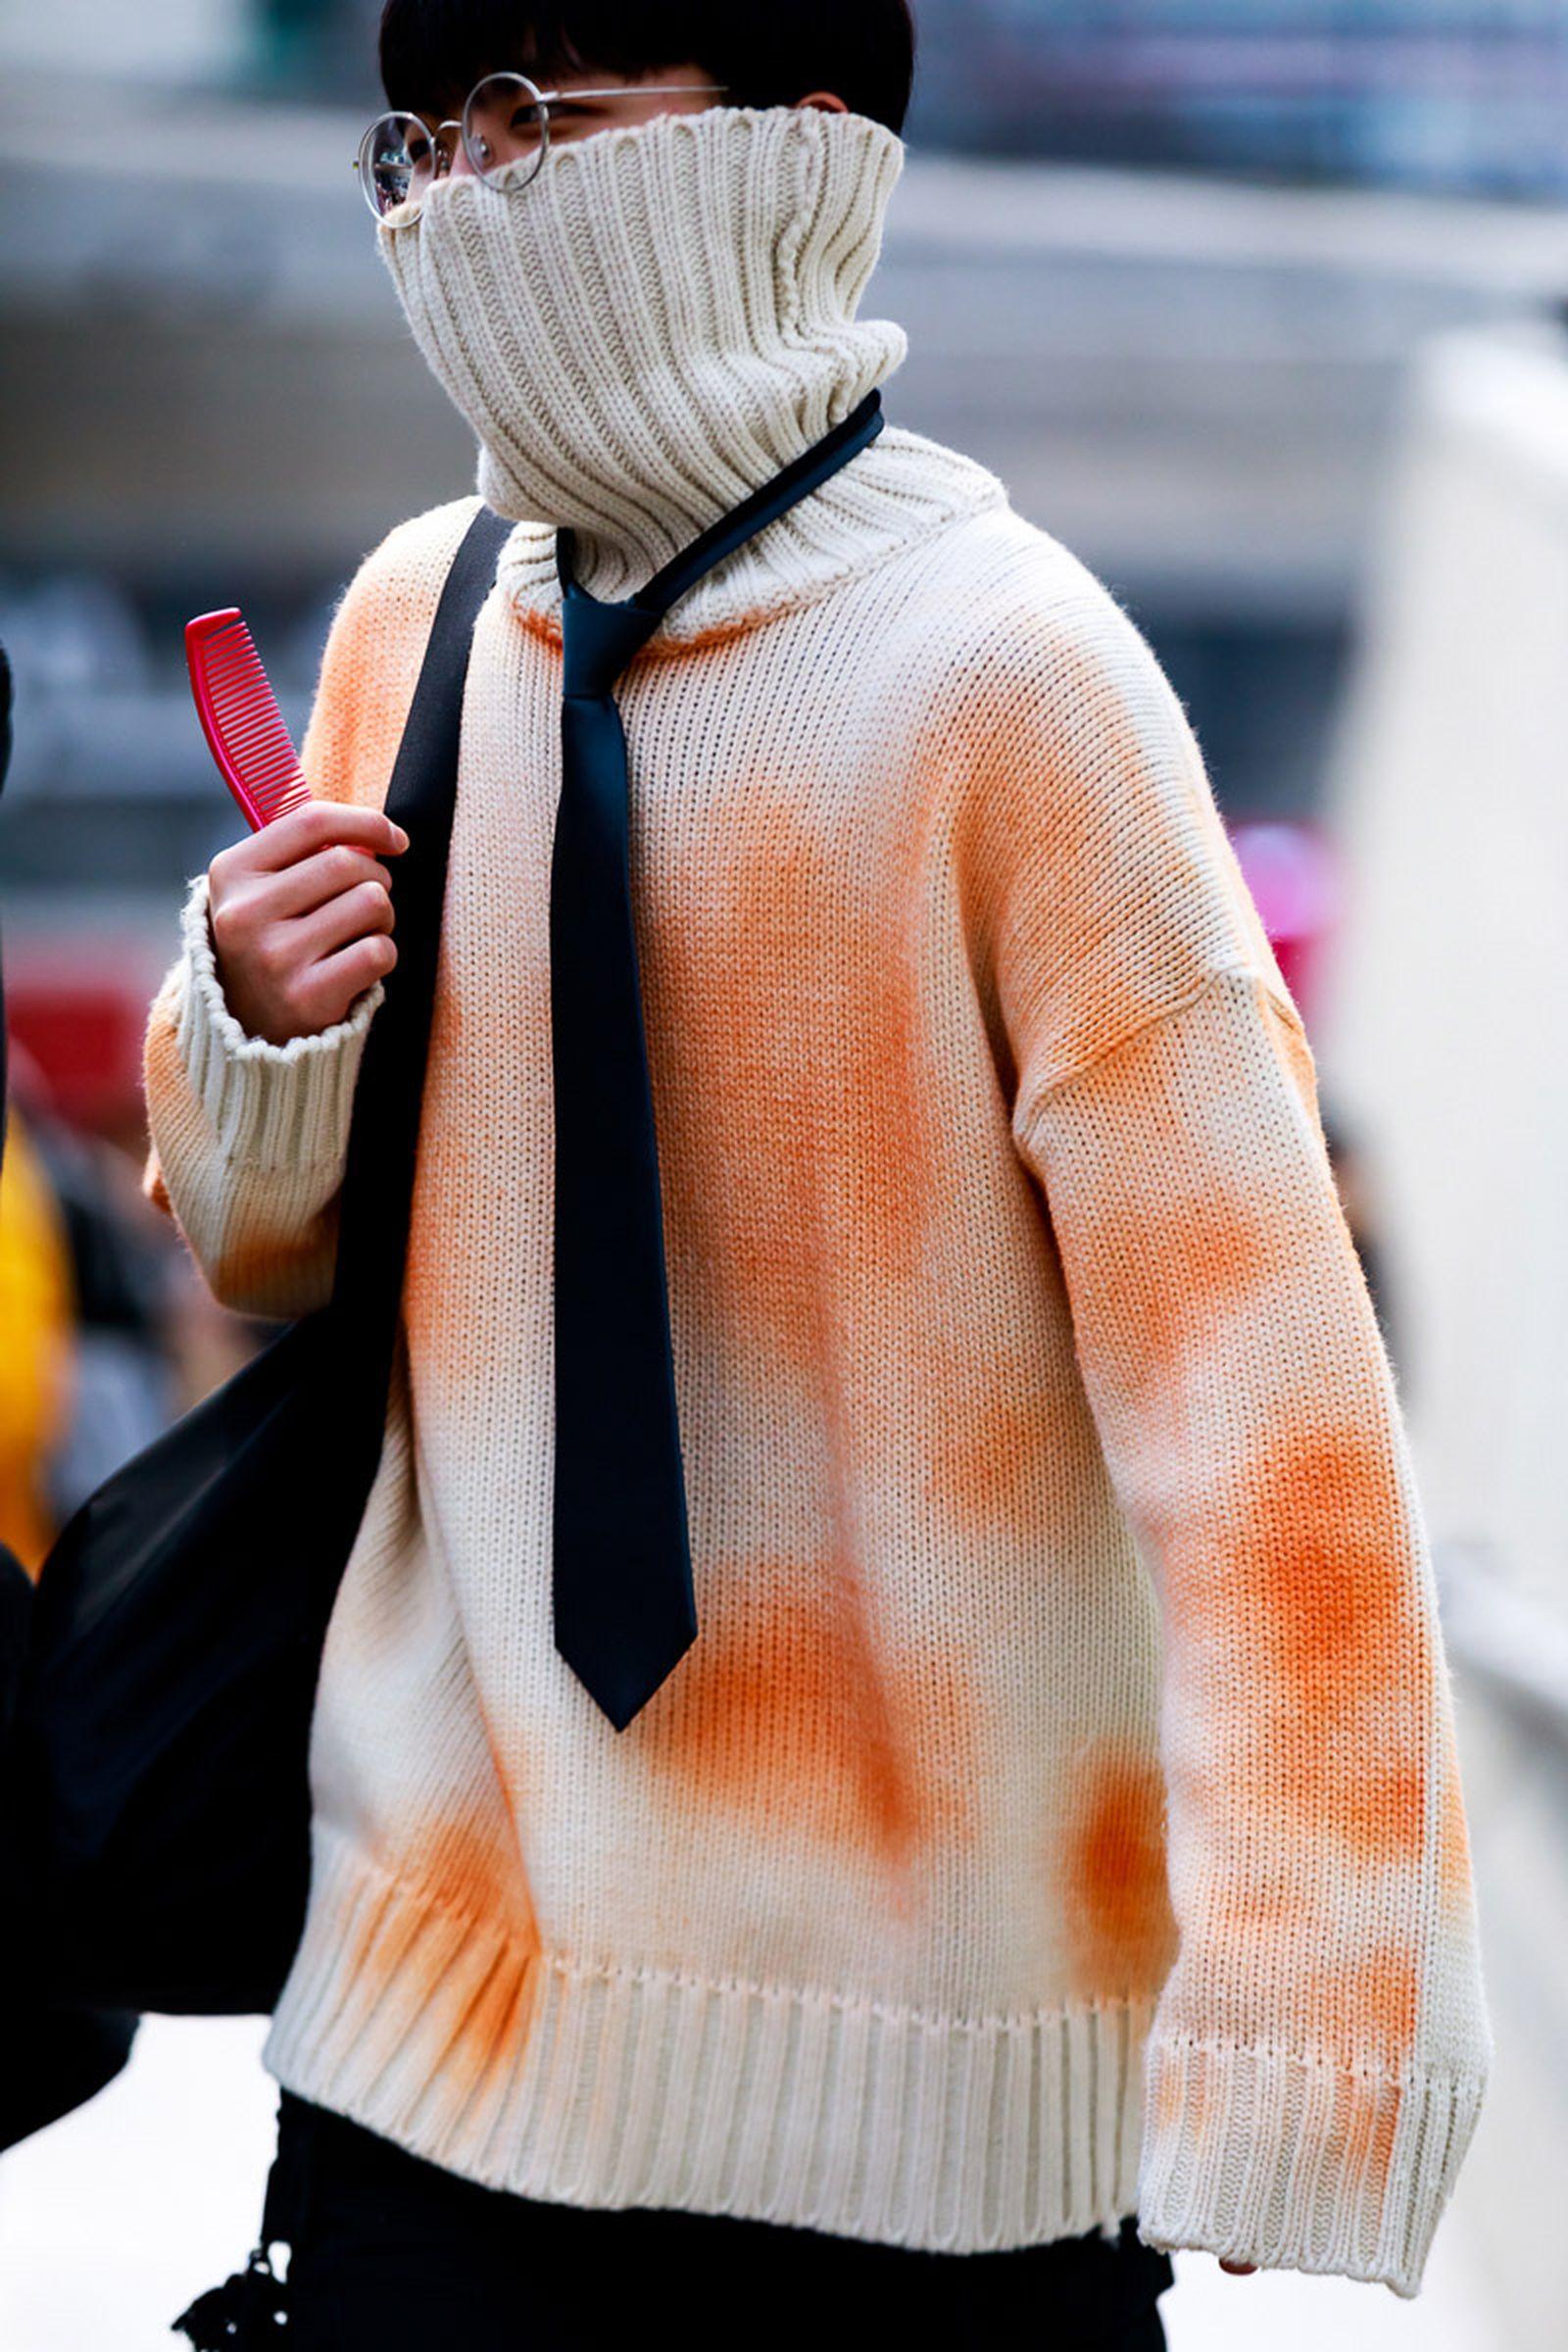 12Seoul street style march paul jeong seoul fashion week